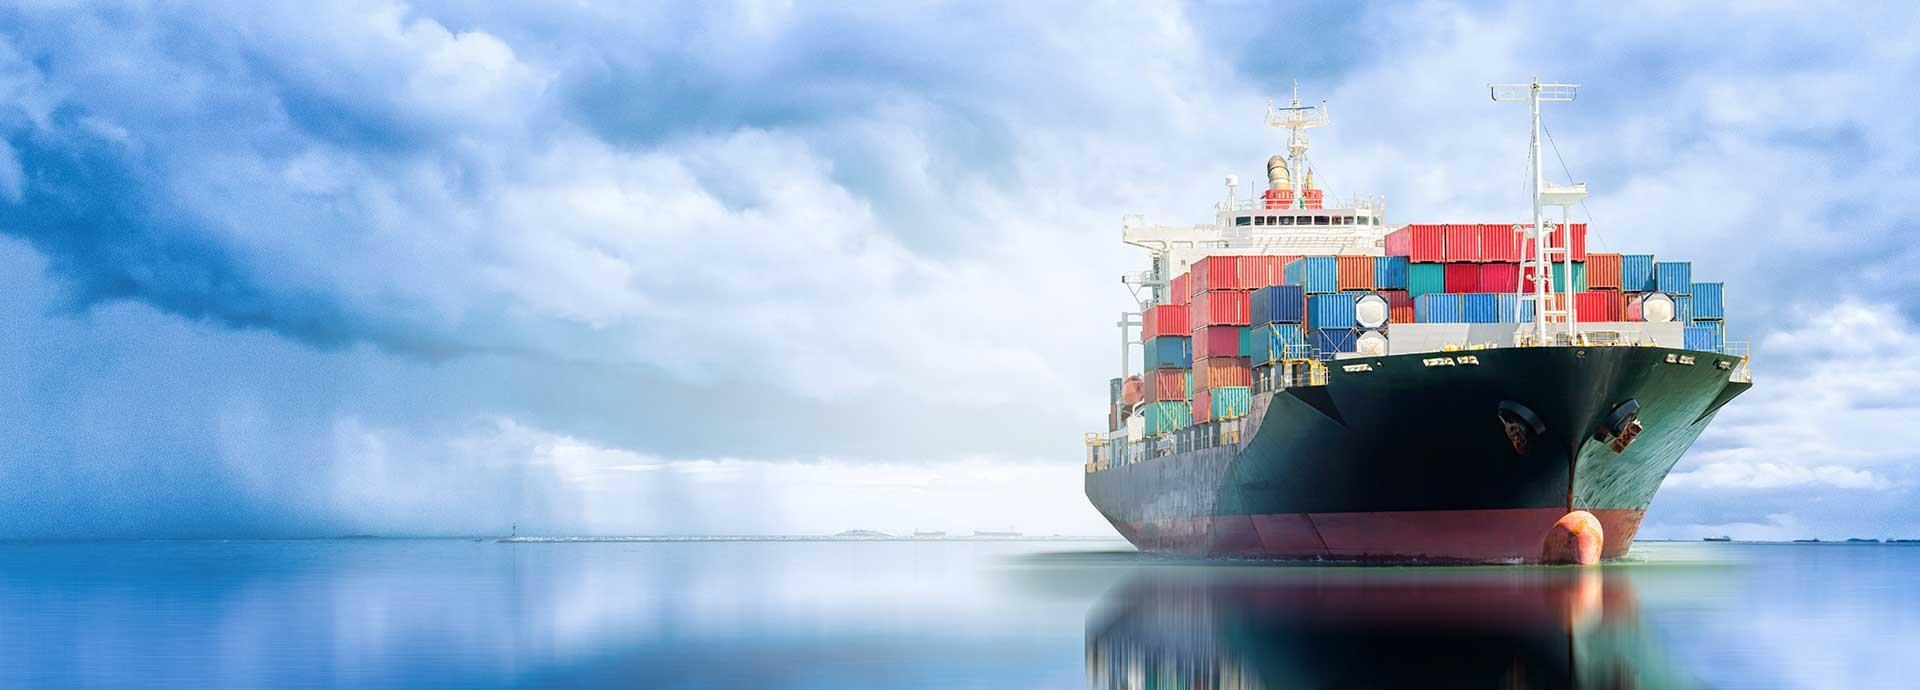 Silent Revolution at Sea: IMO Sulphur Cap 2020 regulations set to change maritime shipping